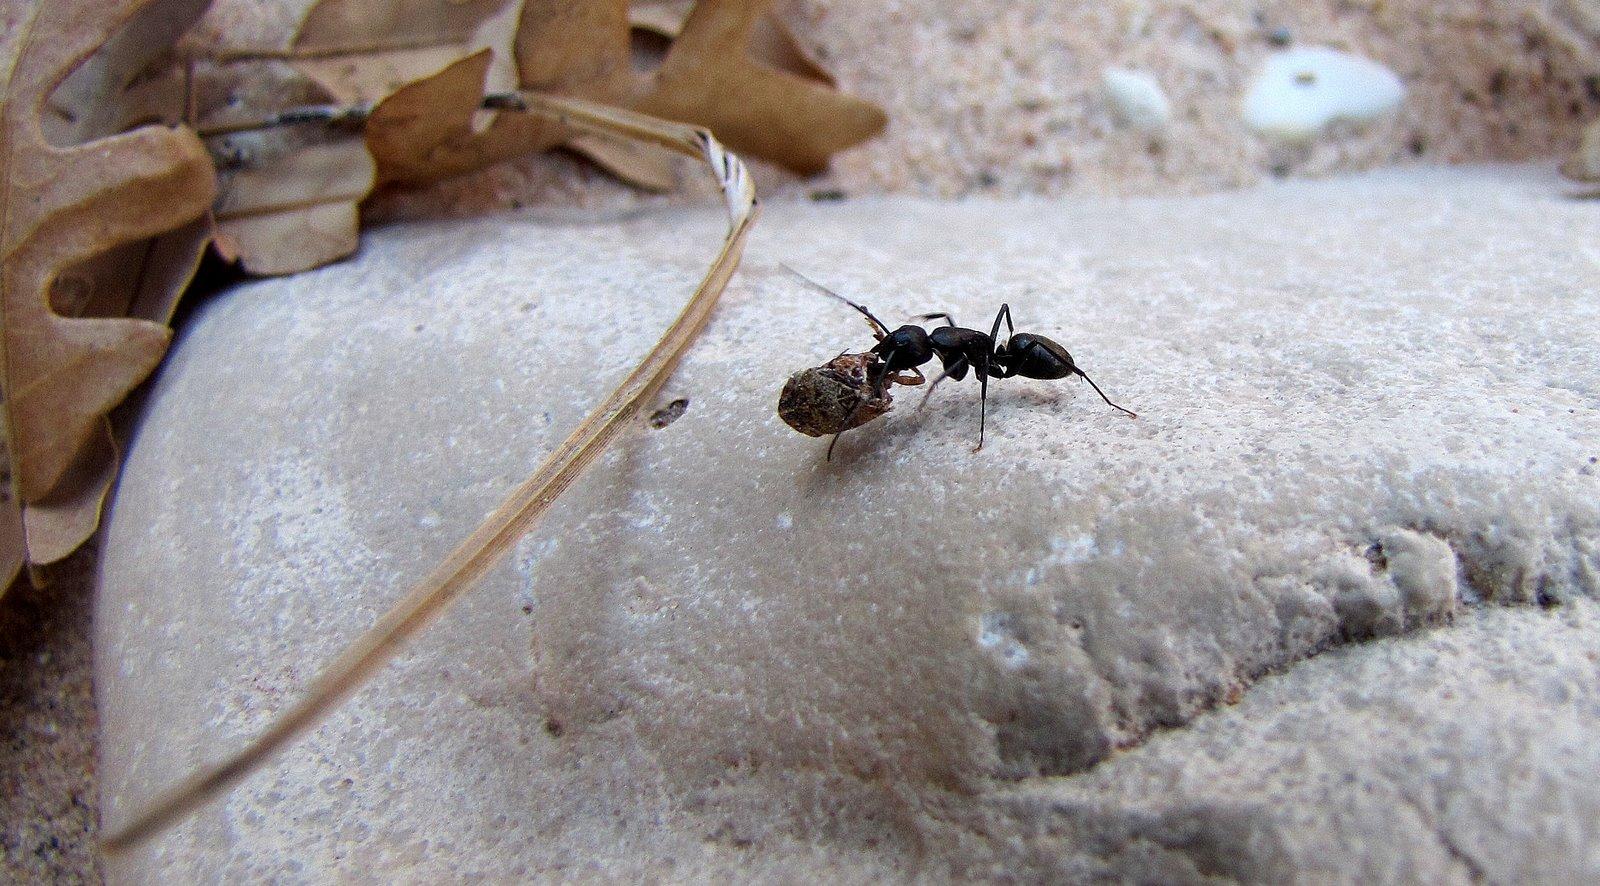 Hangya bogárral fehér kövön  Ant with bug on white stone